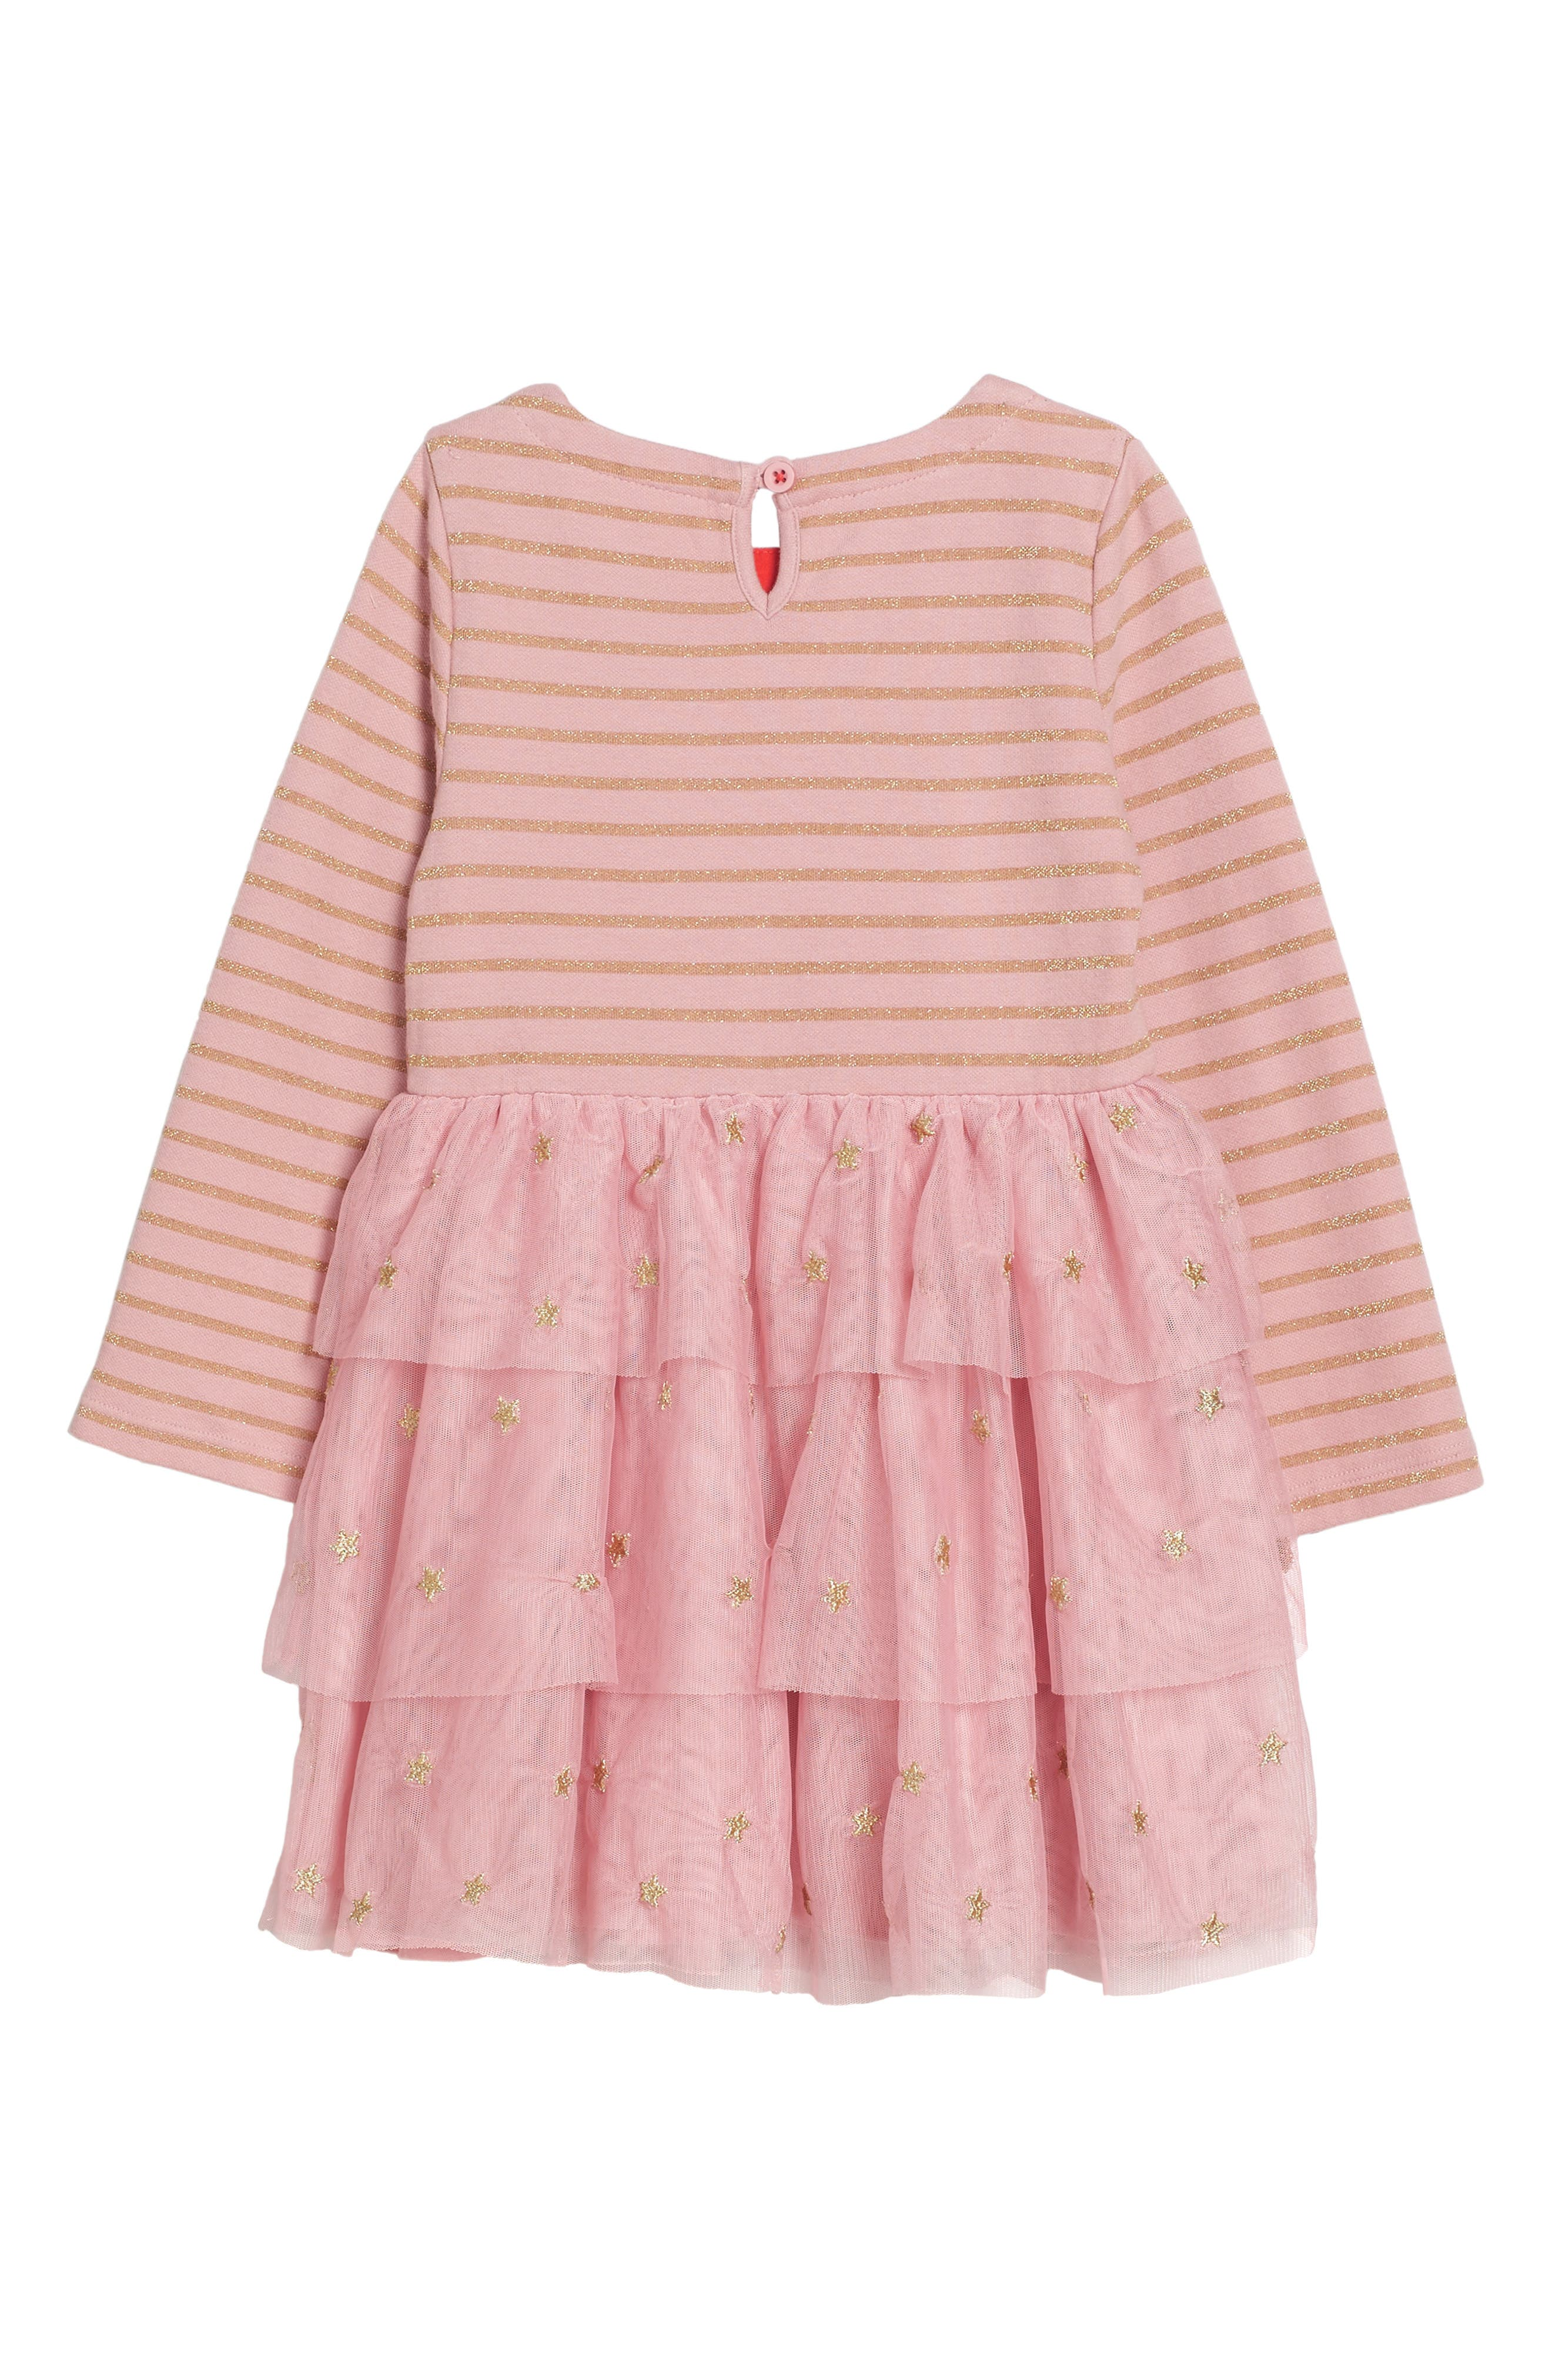 Mixed Media Dress,                             Alternate thumbnail 2, color,                             664